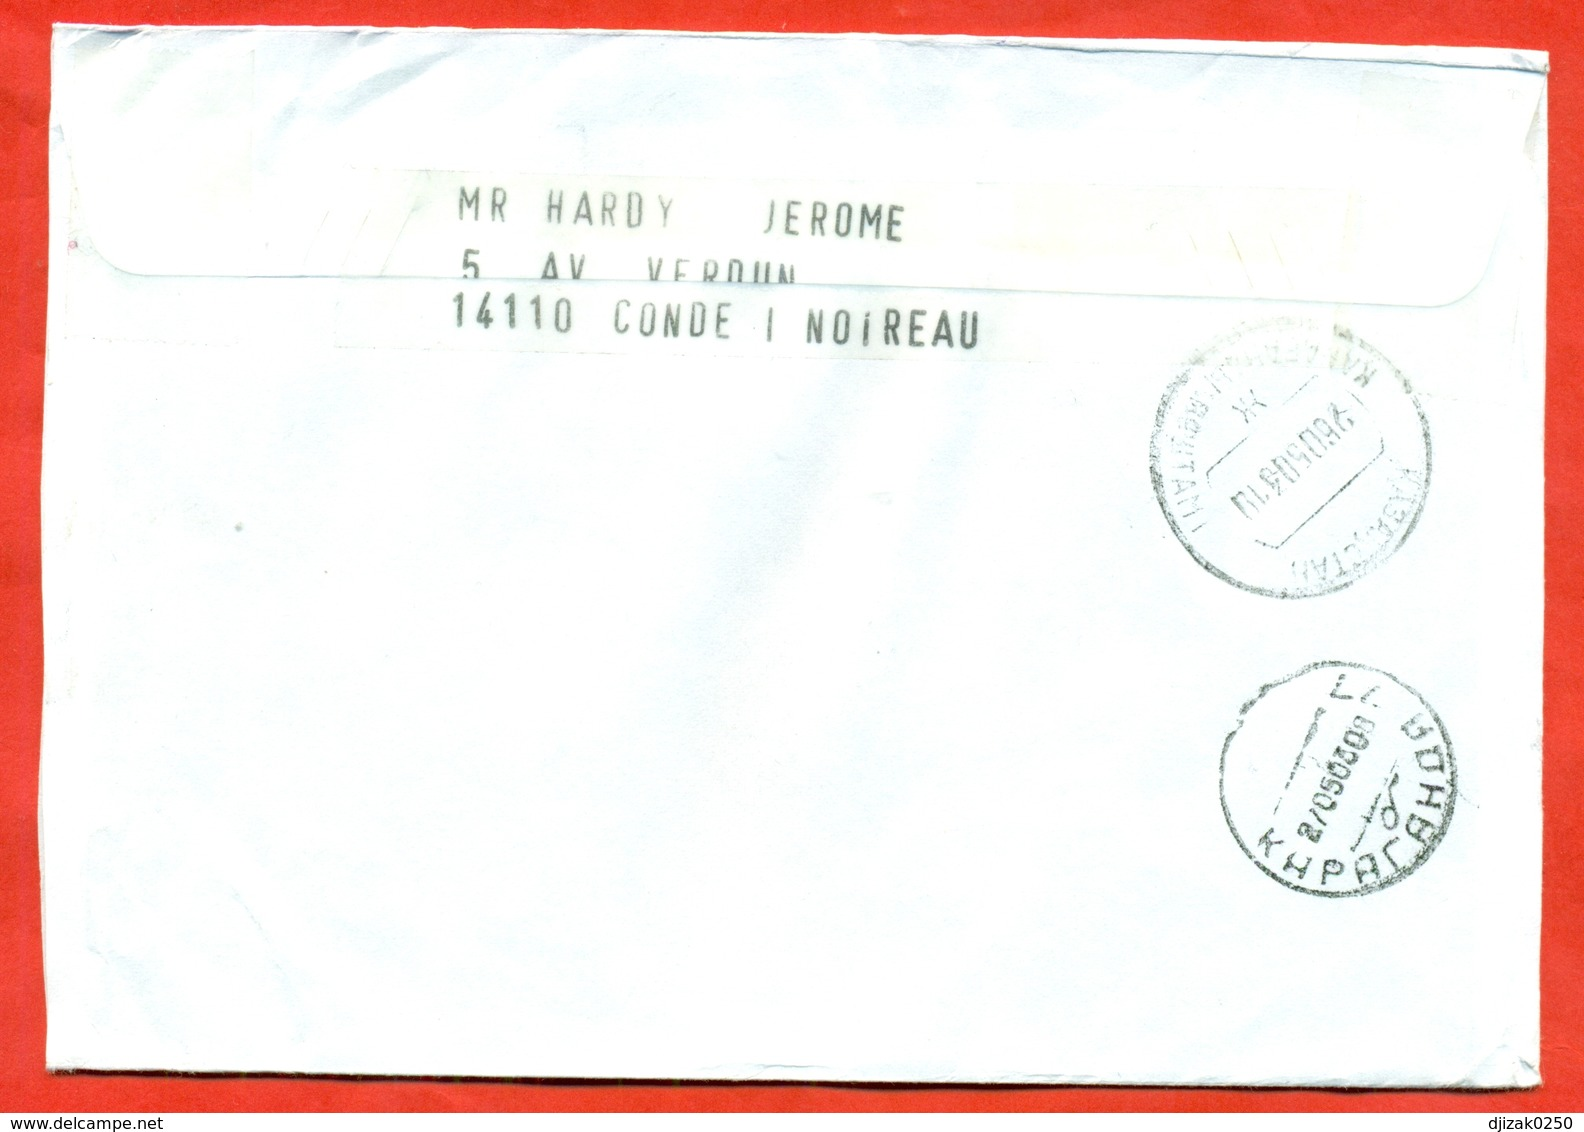 France 2003.Stefanik.Valentine's Day. Aircraft.Envelope Passed The Mail. - France